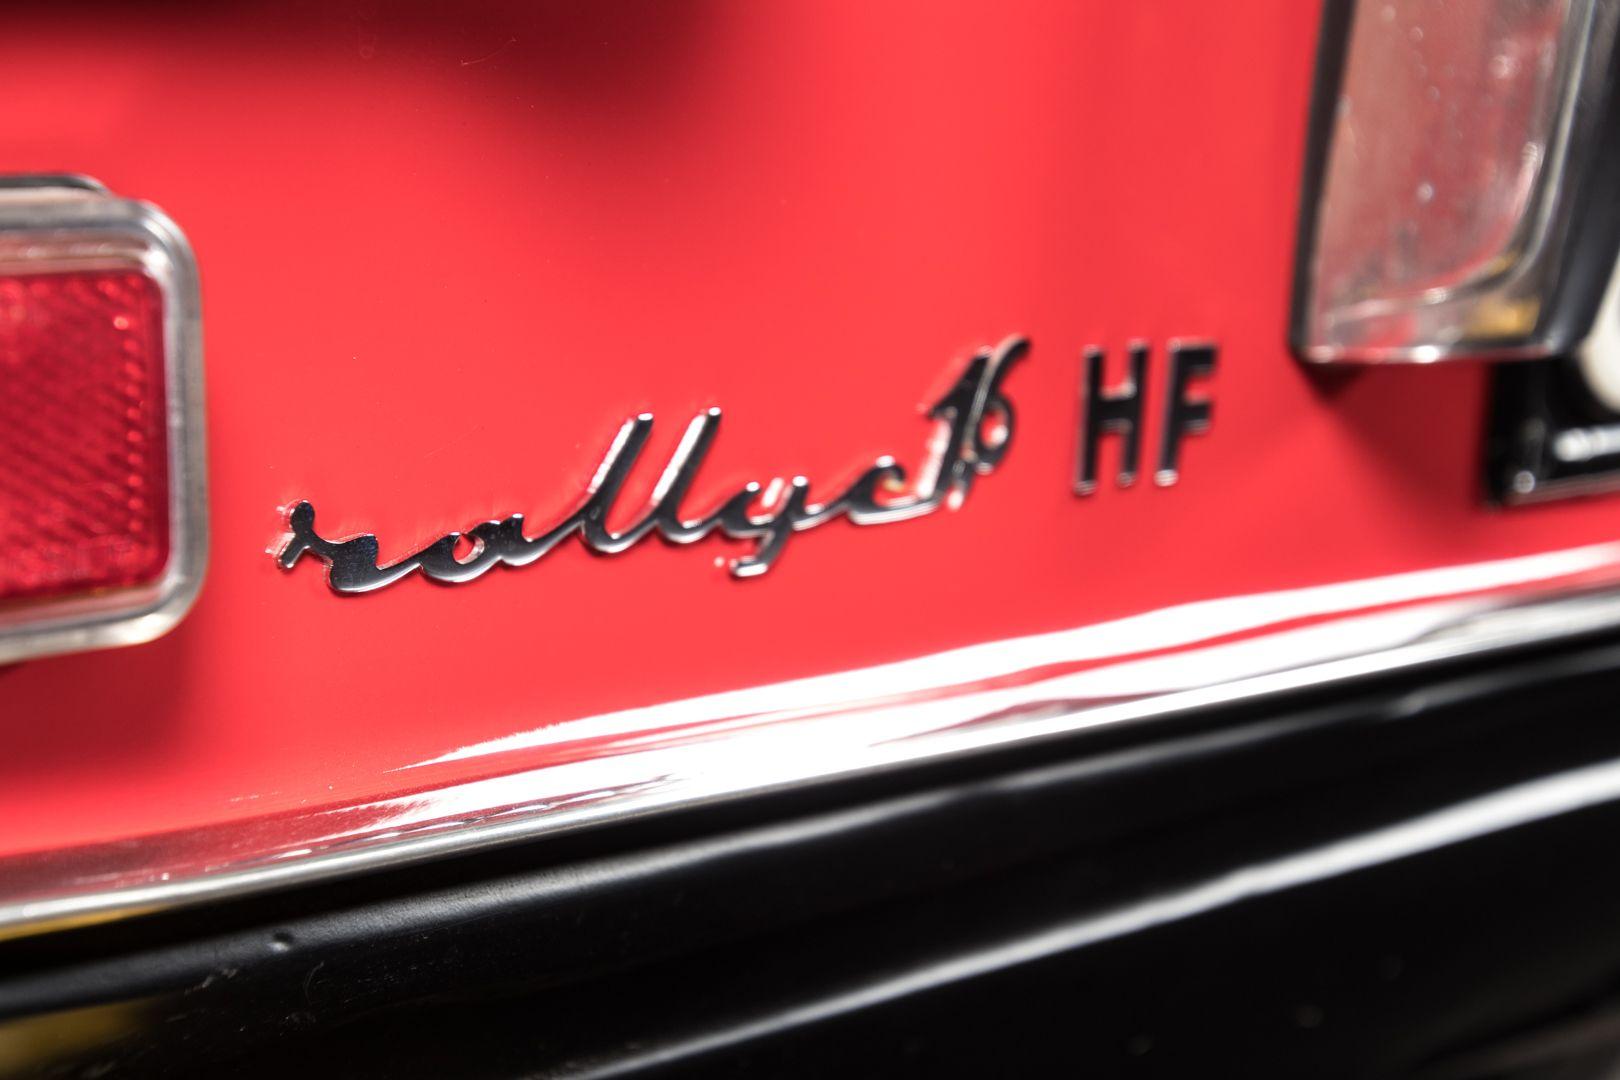 1970 Lancia Fulvia HF 1.6 - Gruppo 4 18811